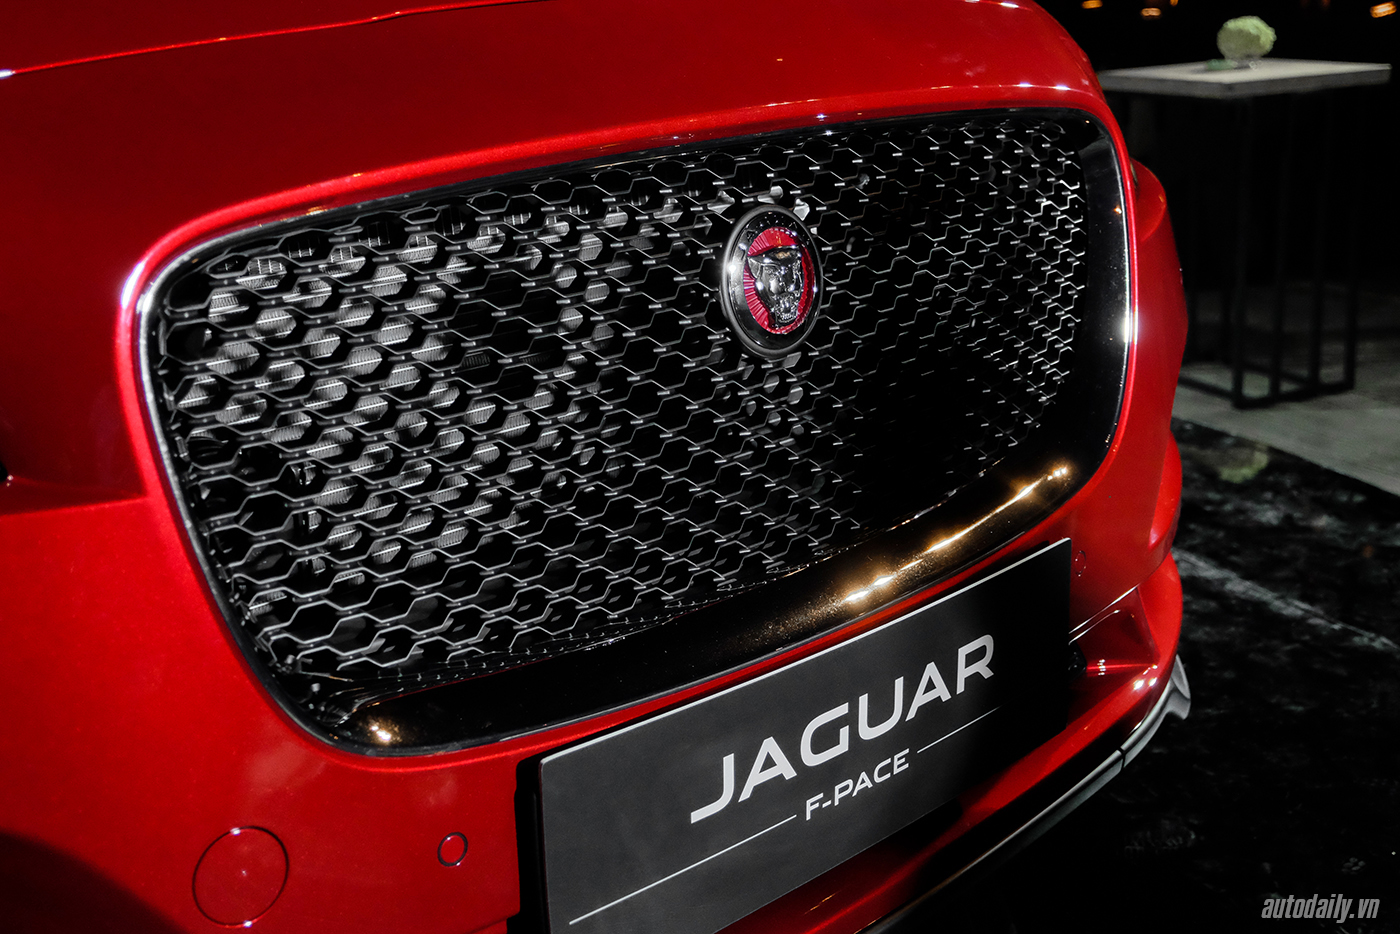 jaguar-f-pace-suv-28.jpg